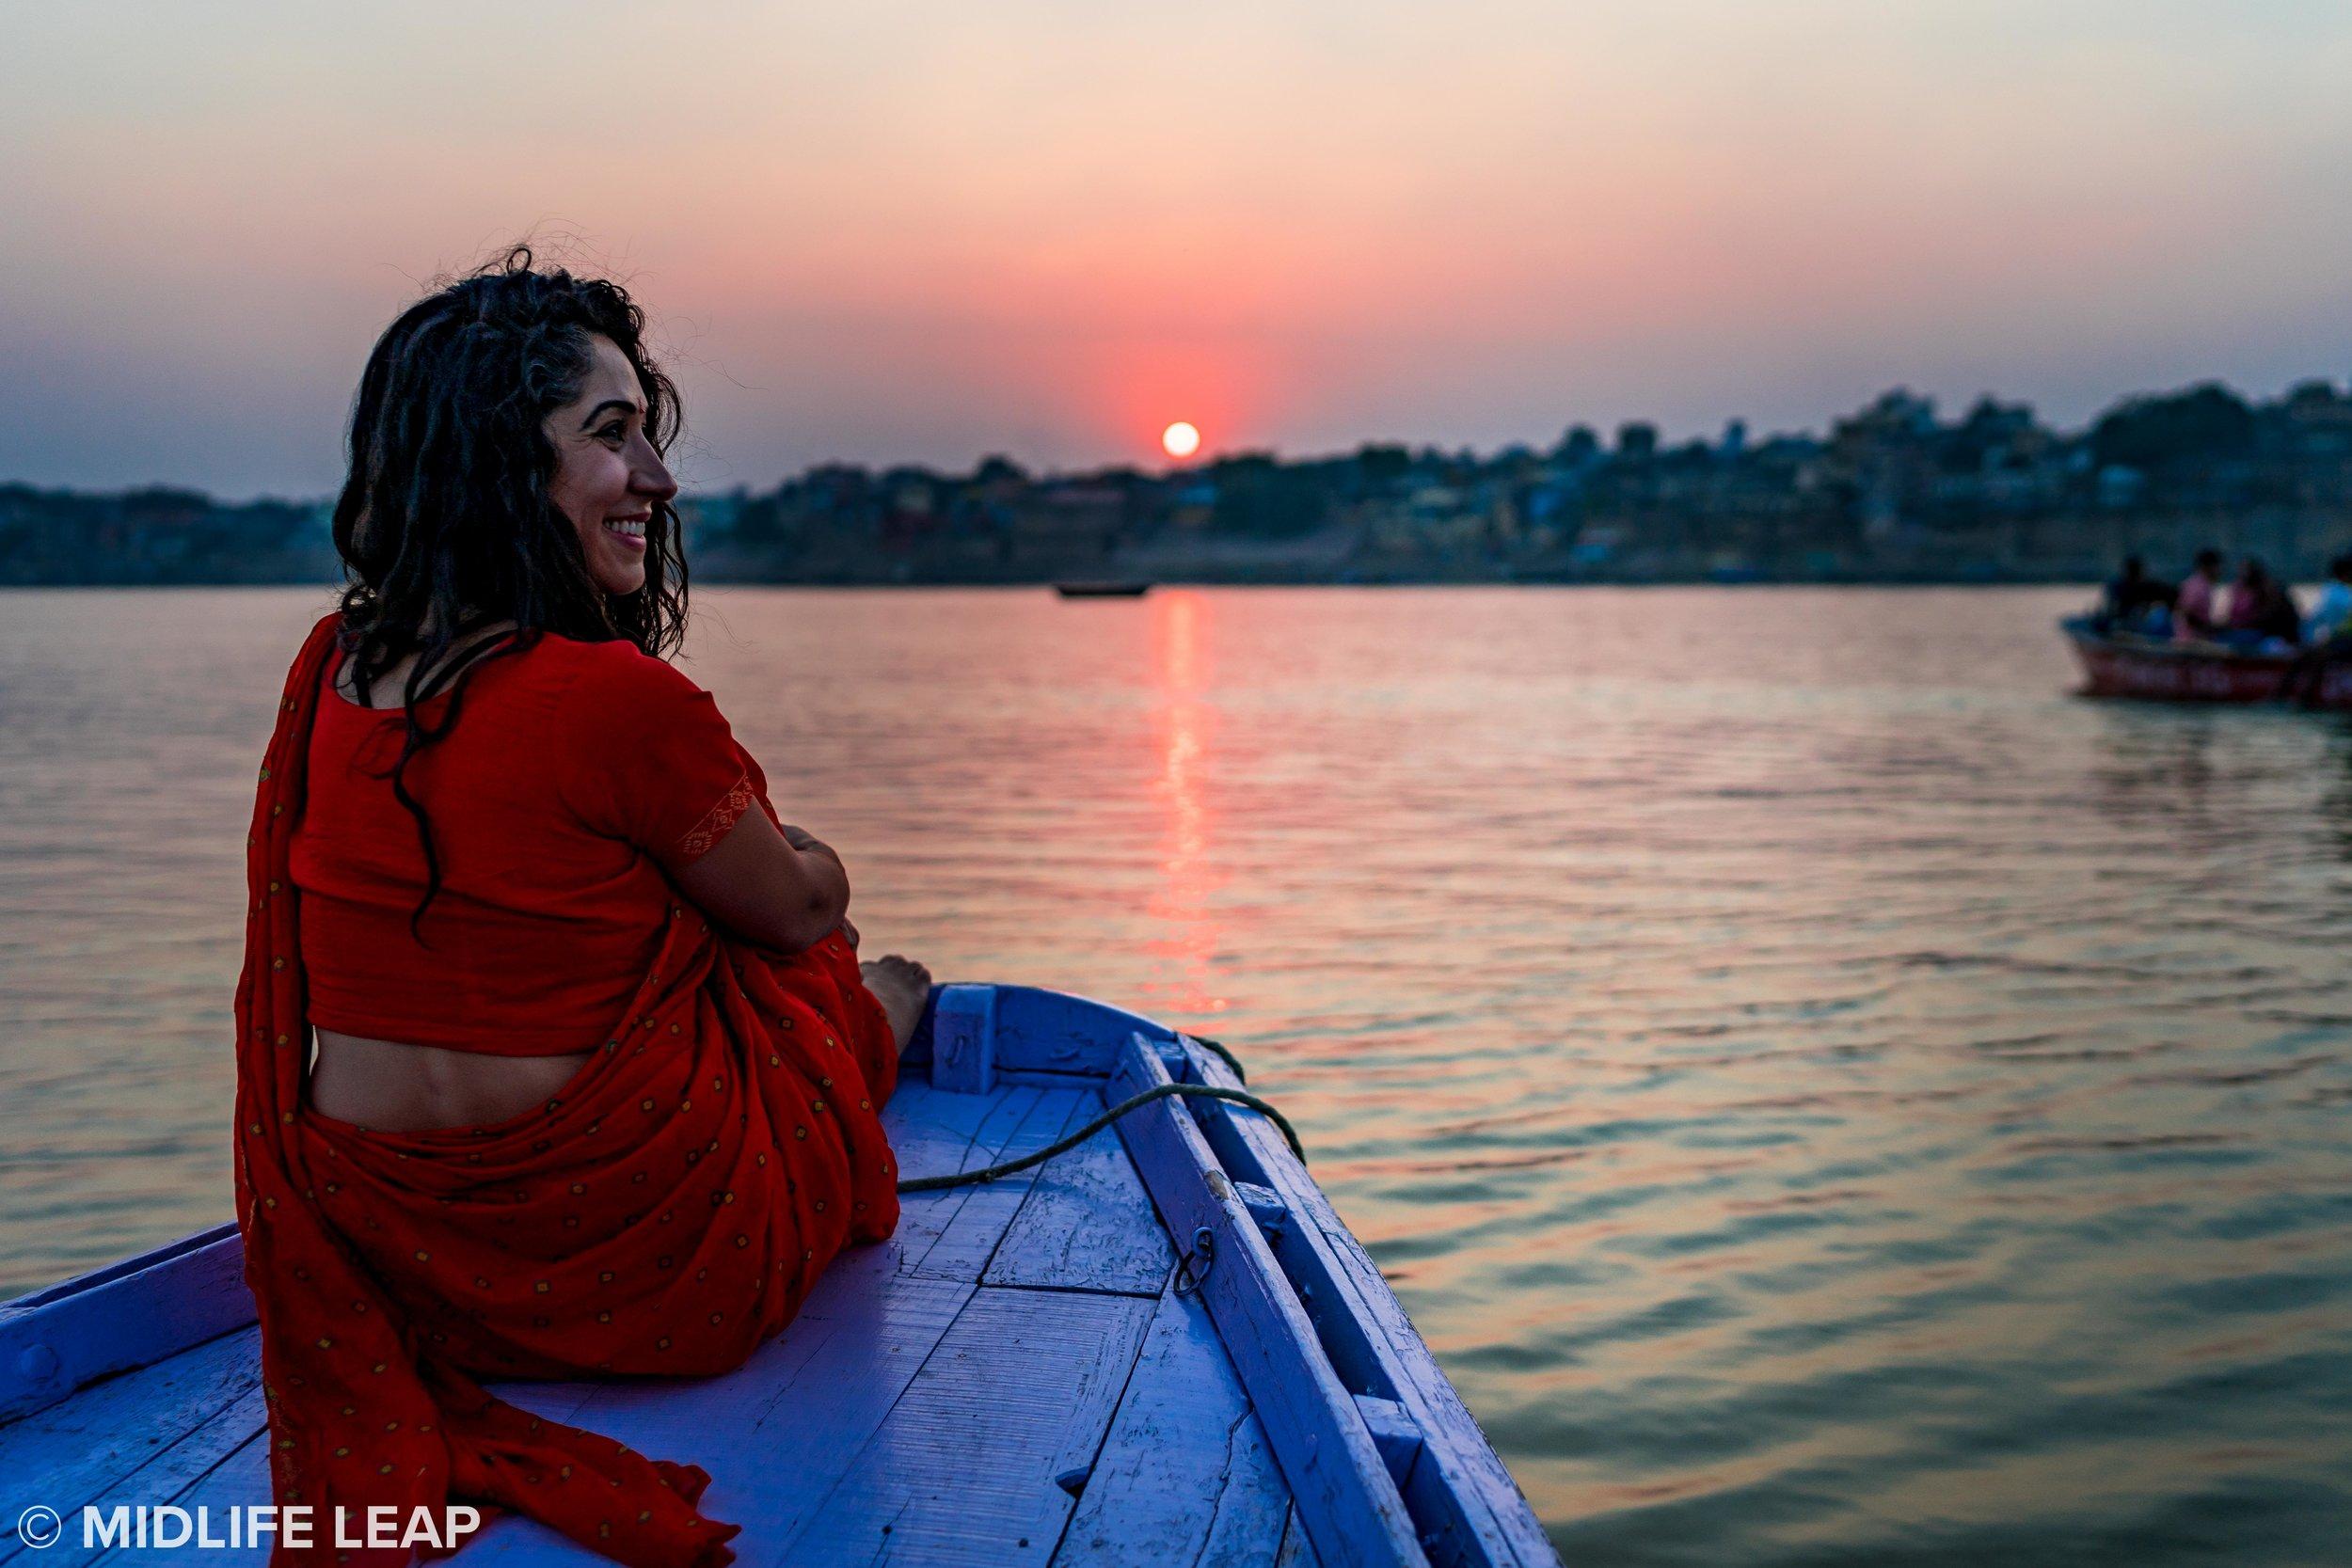 varanasi-ganges-boat-ride-sunset.jpg